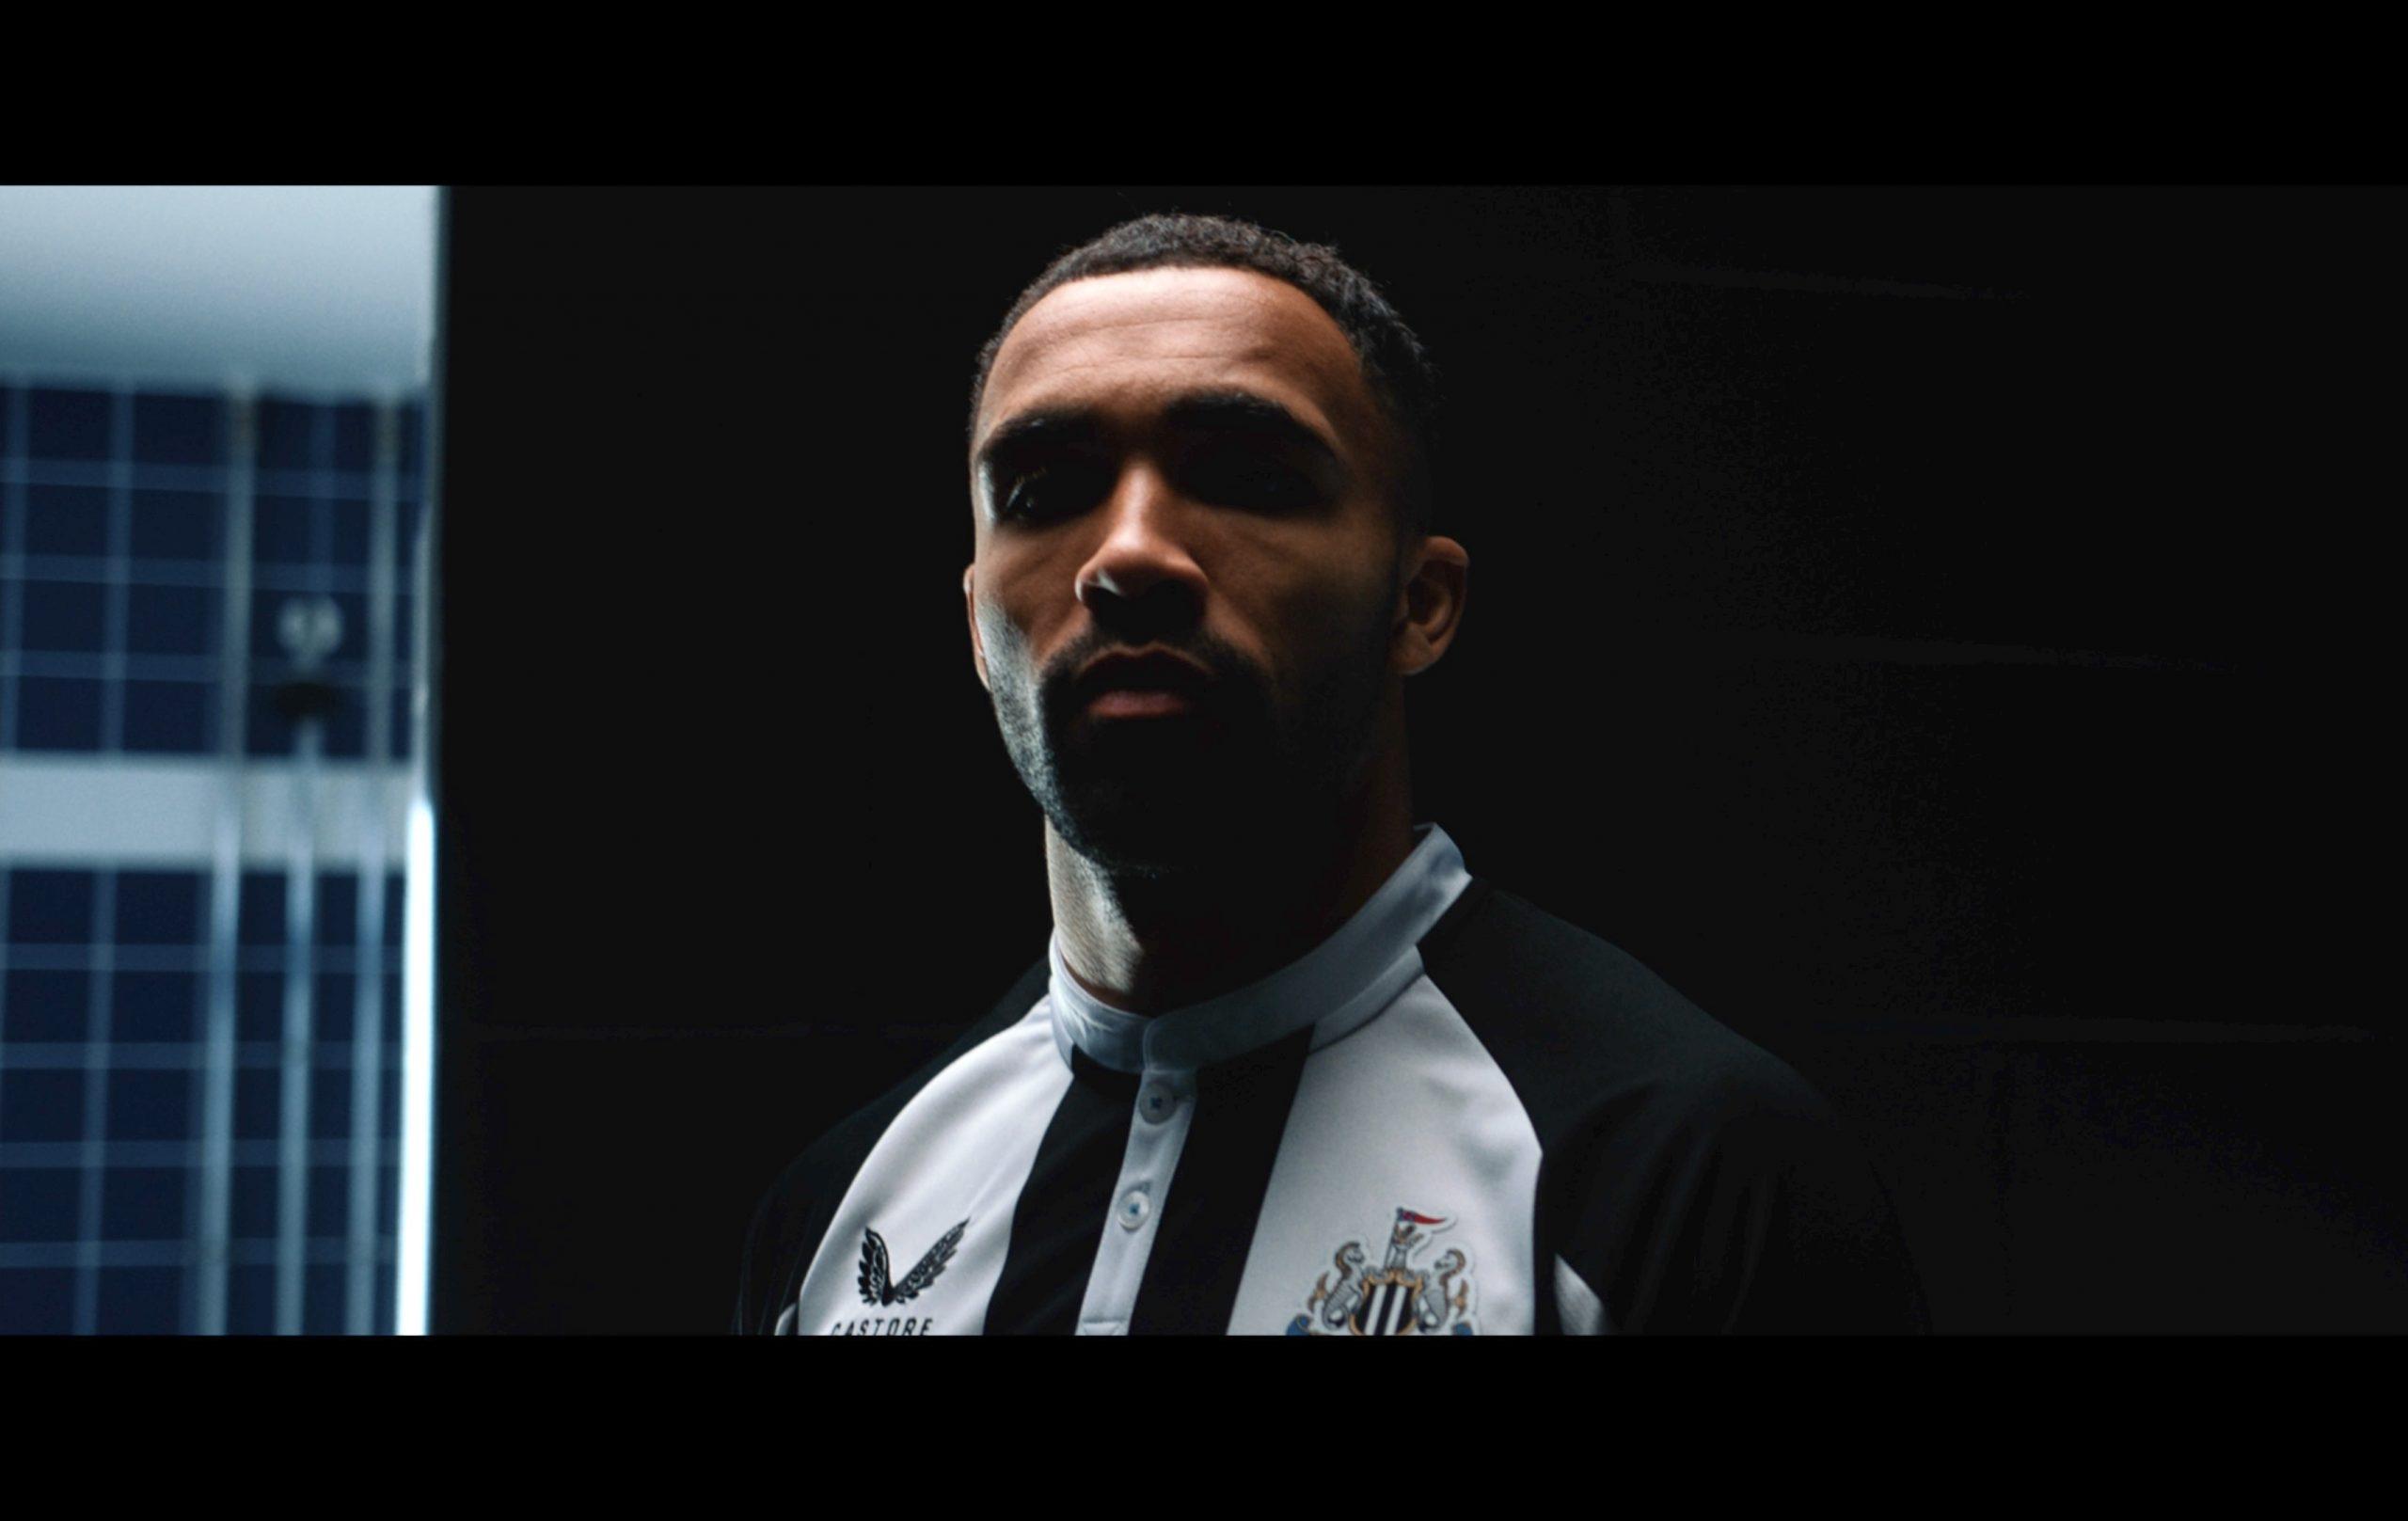 CASTORE | Newcastle United Home Shirt 21/22 Video Production Birmingham